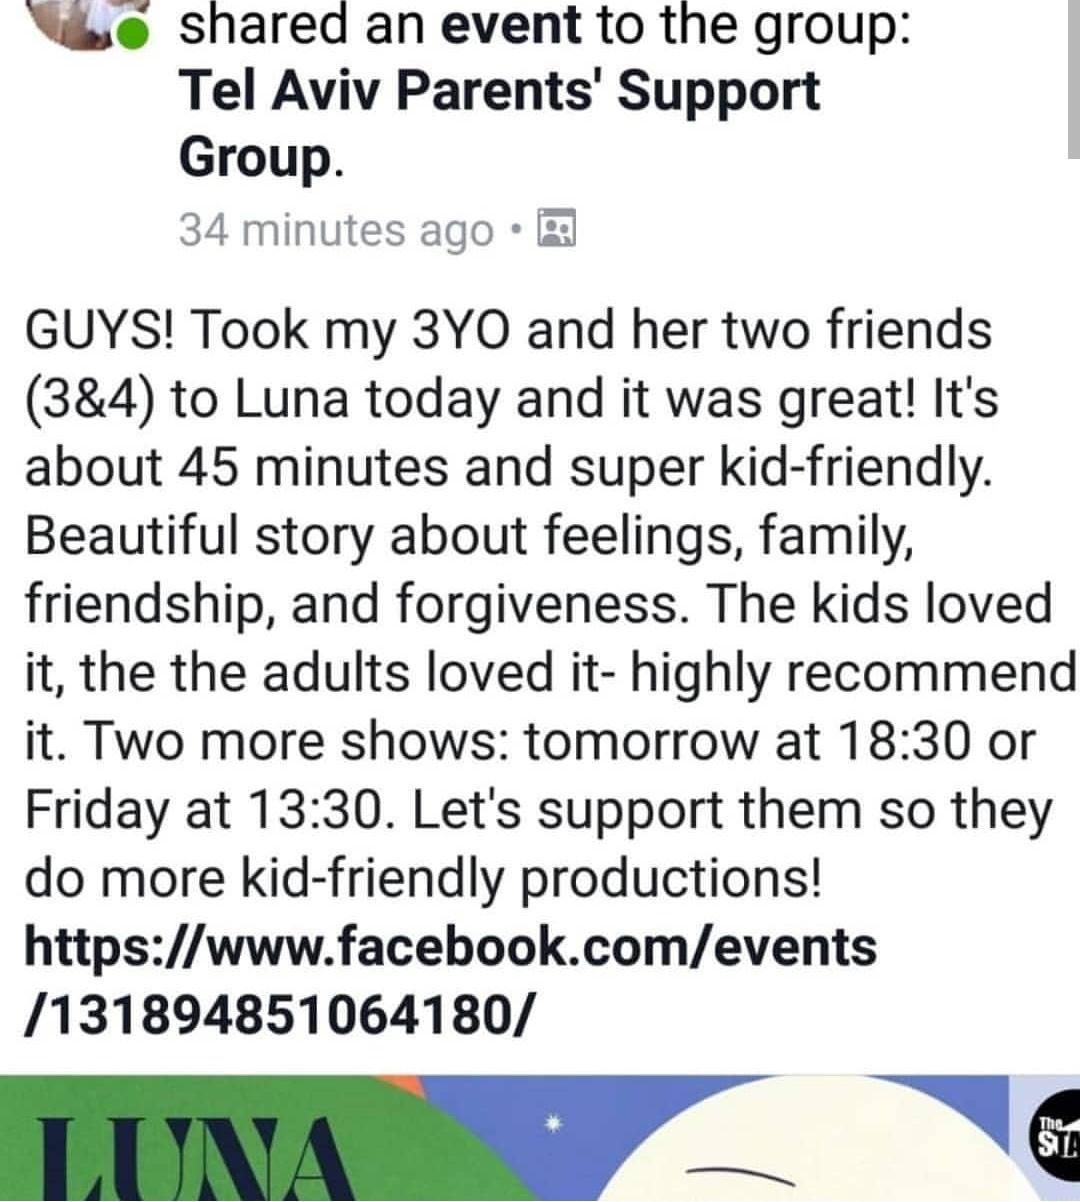 Parents feedback